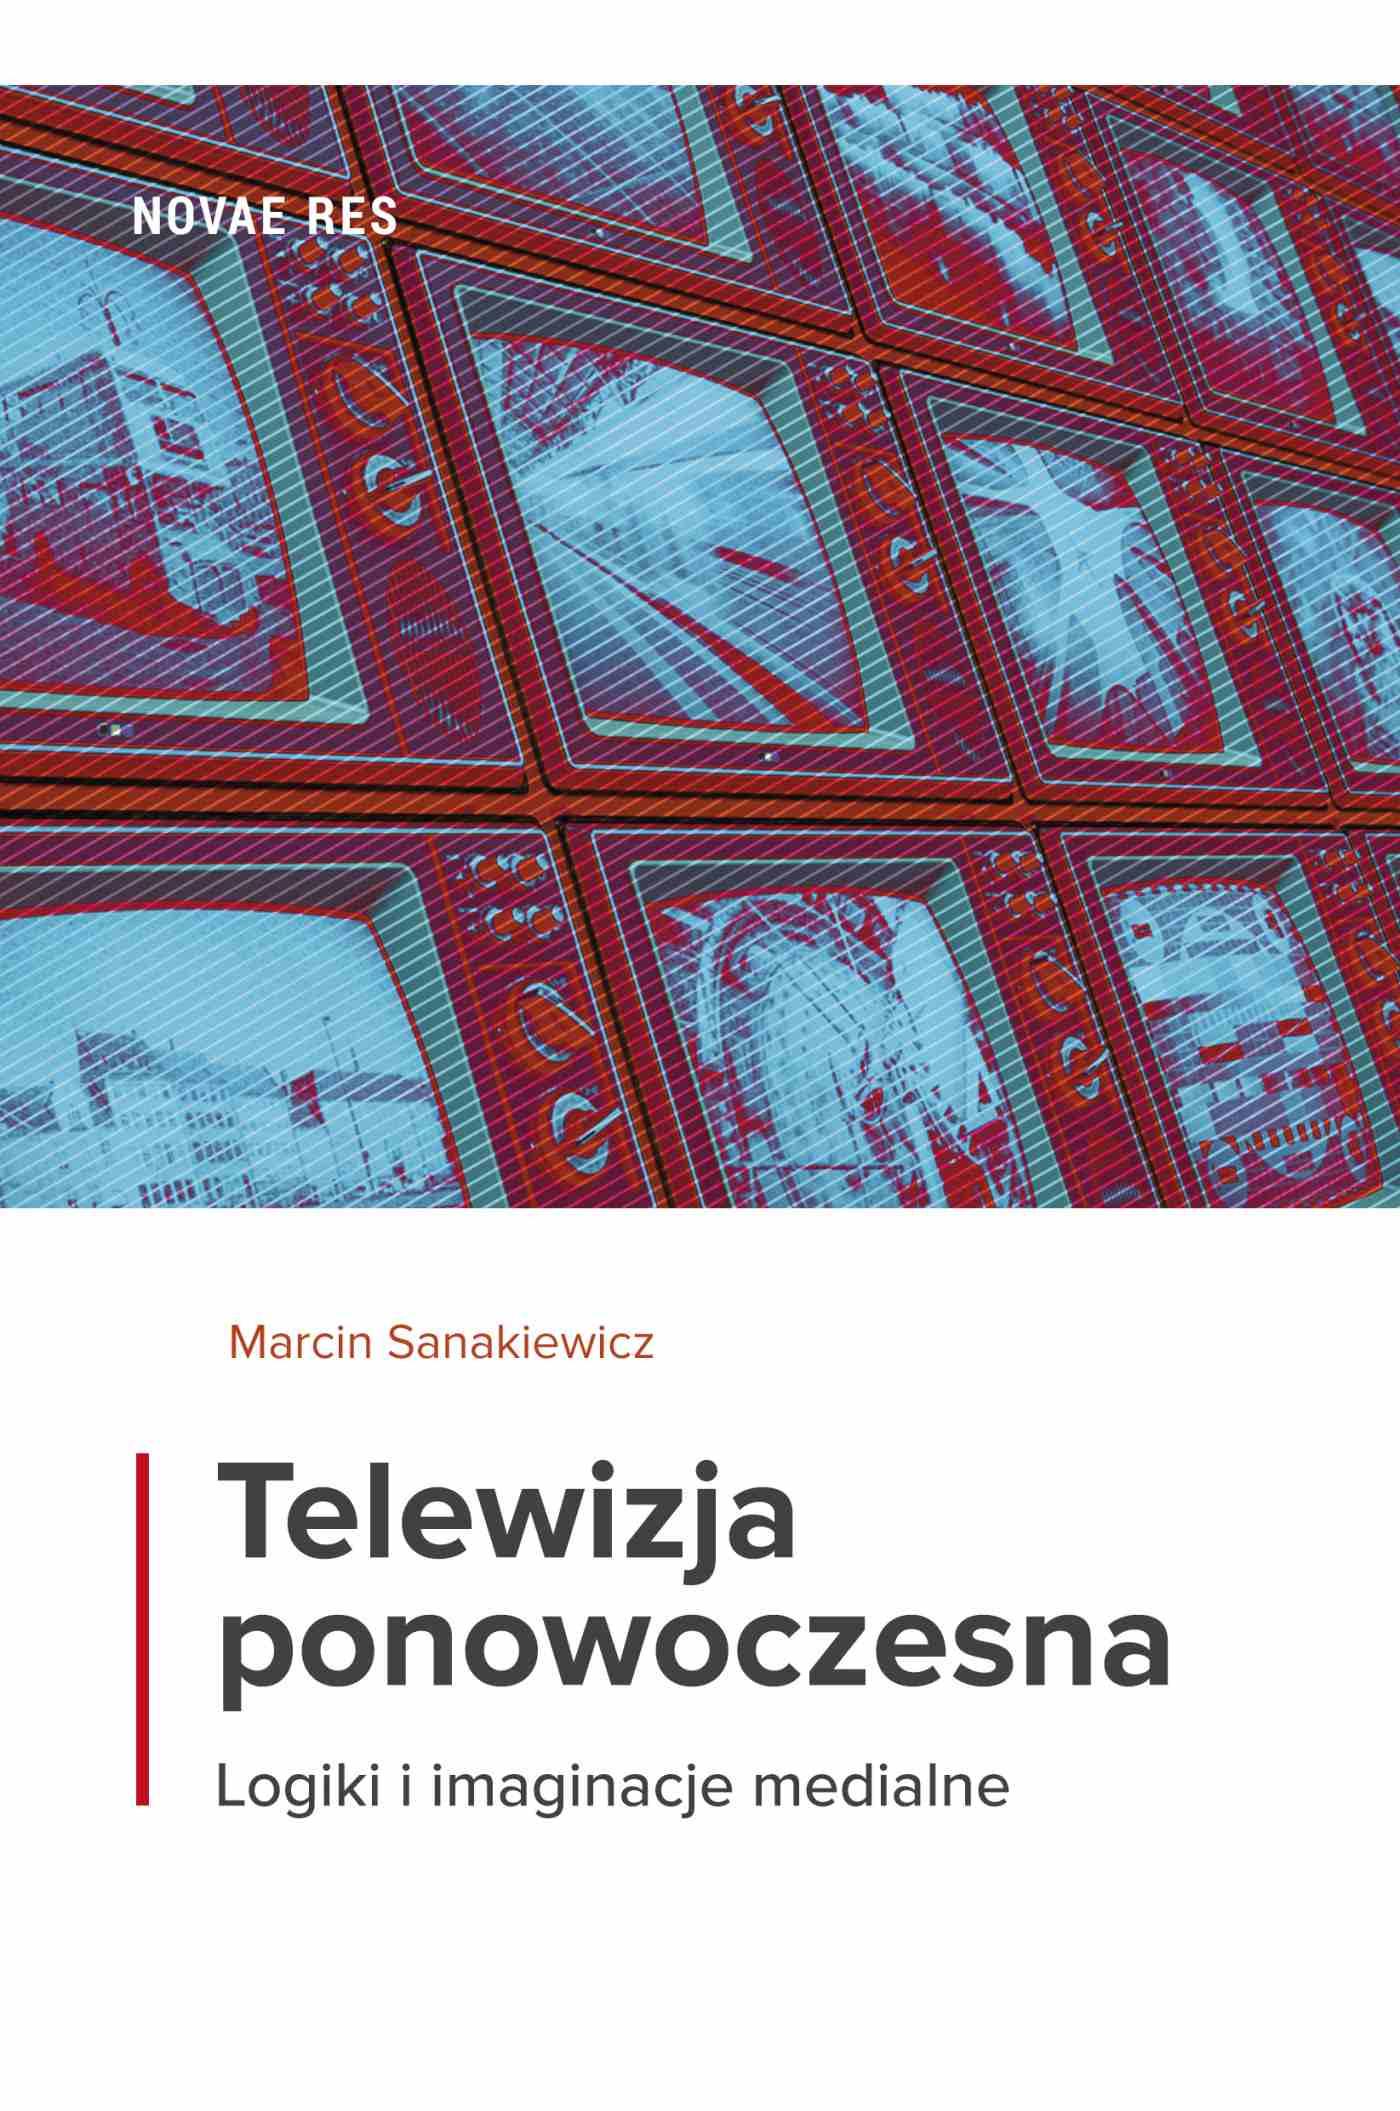 Telewizja ponowoczesna. Logiki i imaginacje medialne - Ebook (Książka na Kindle) do pobrania w formacie MOBI